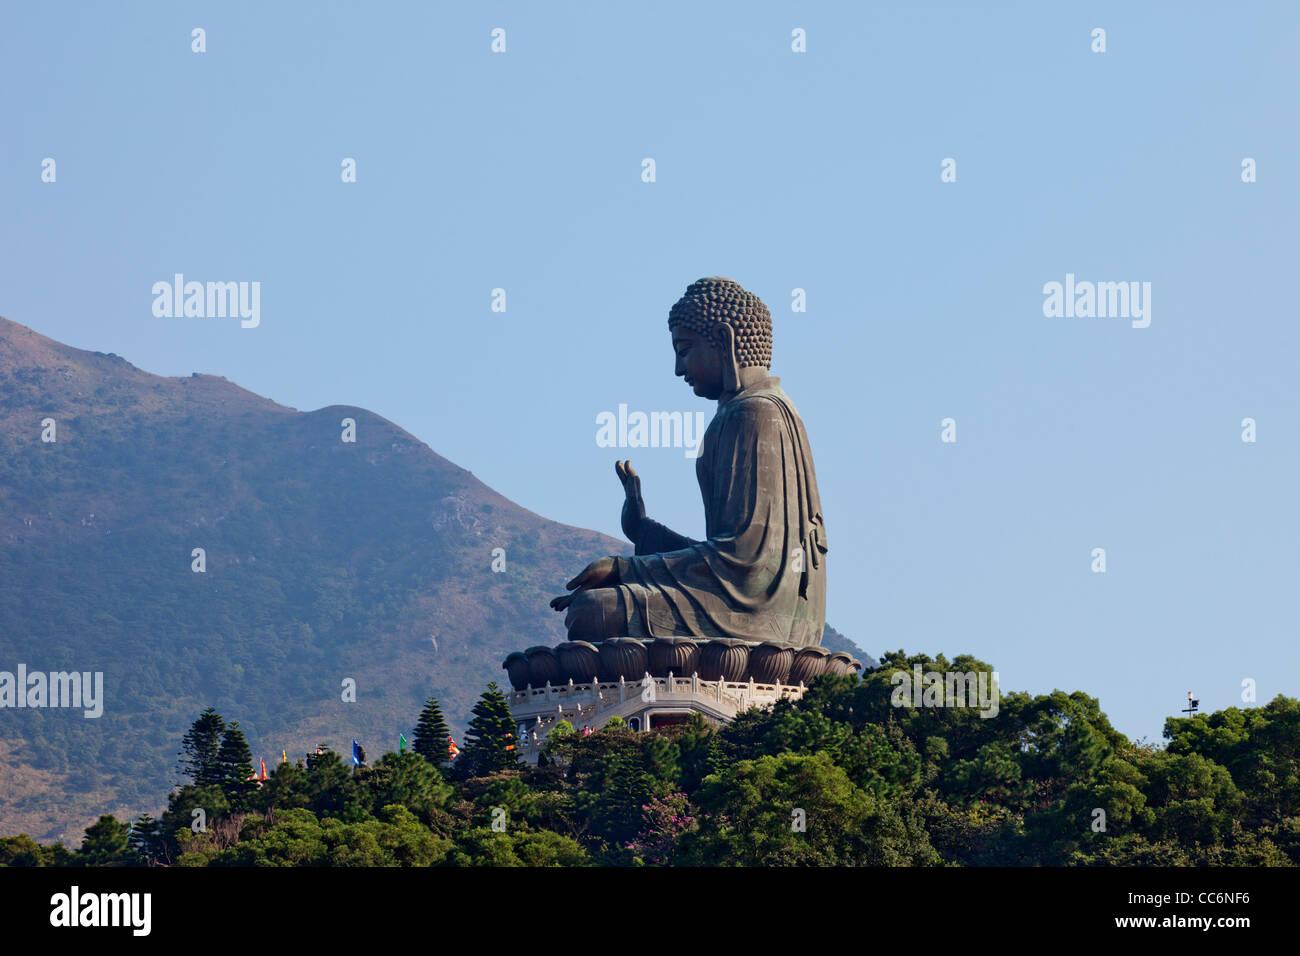 China, Hong Kong, Lantau, Po Lin Monastery, Giant Buddha Statue - Stock Image